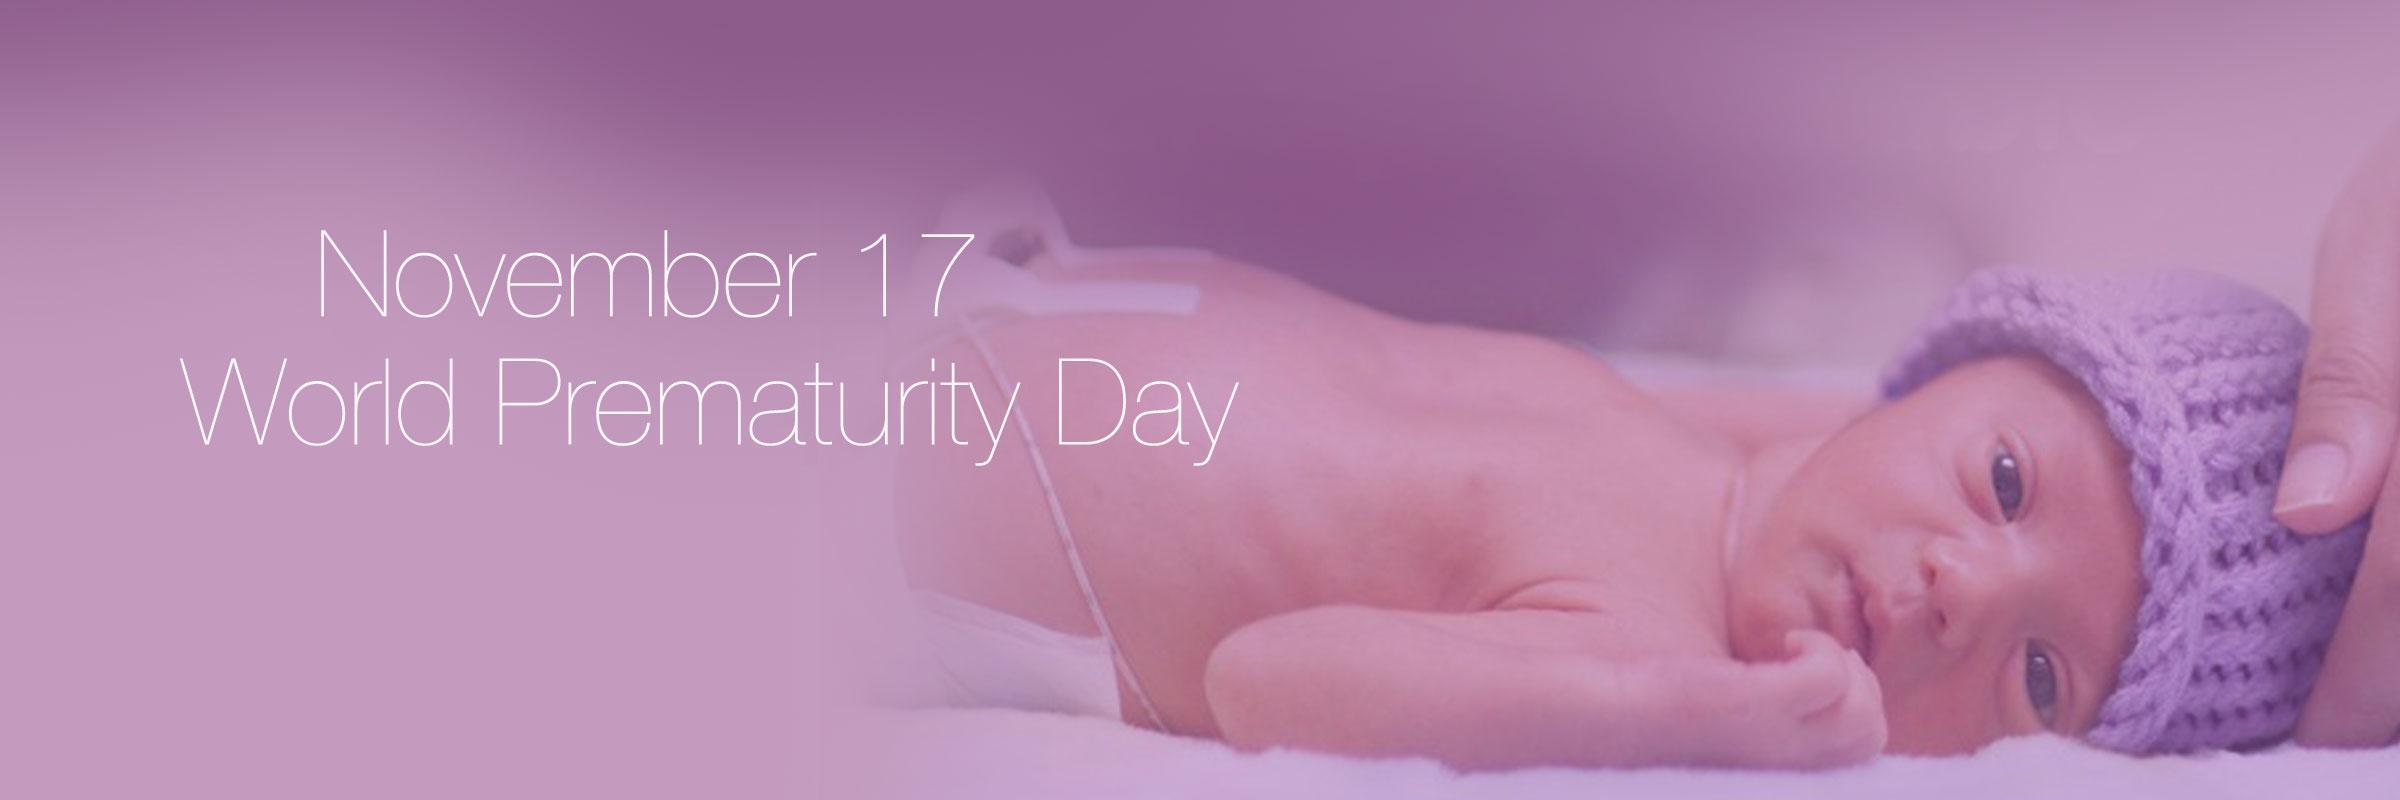 11-world-prematurity